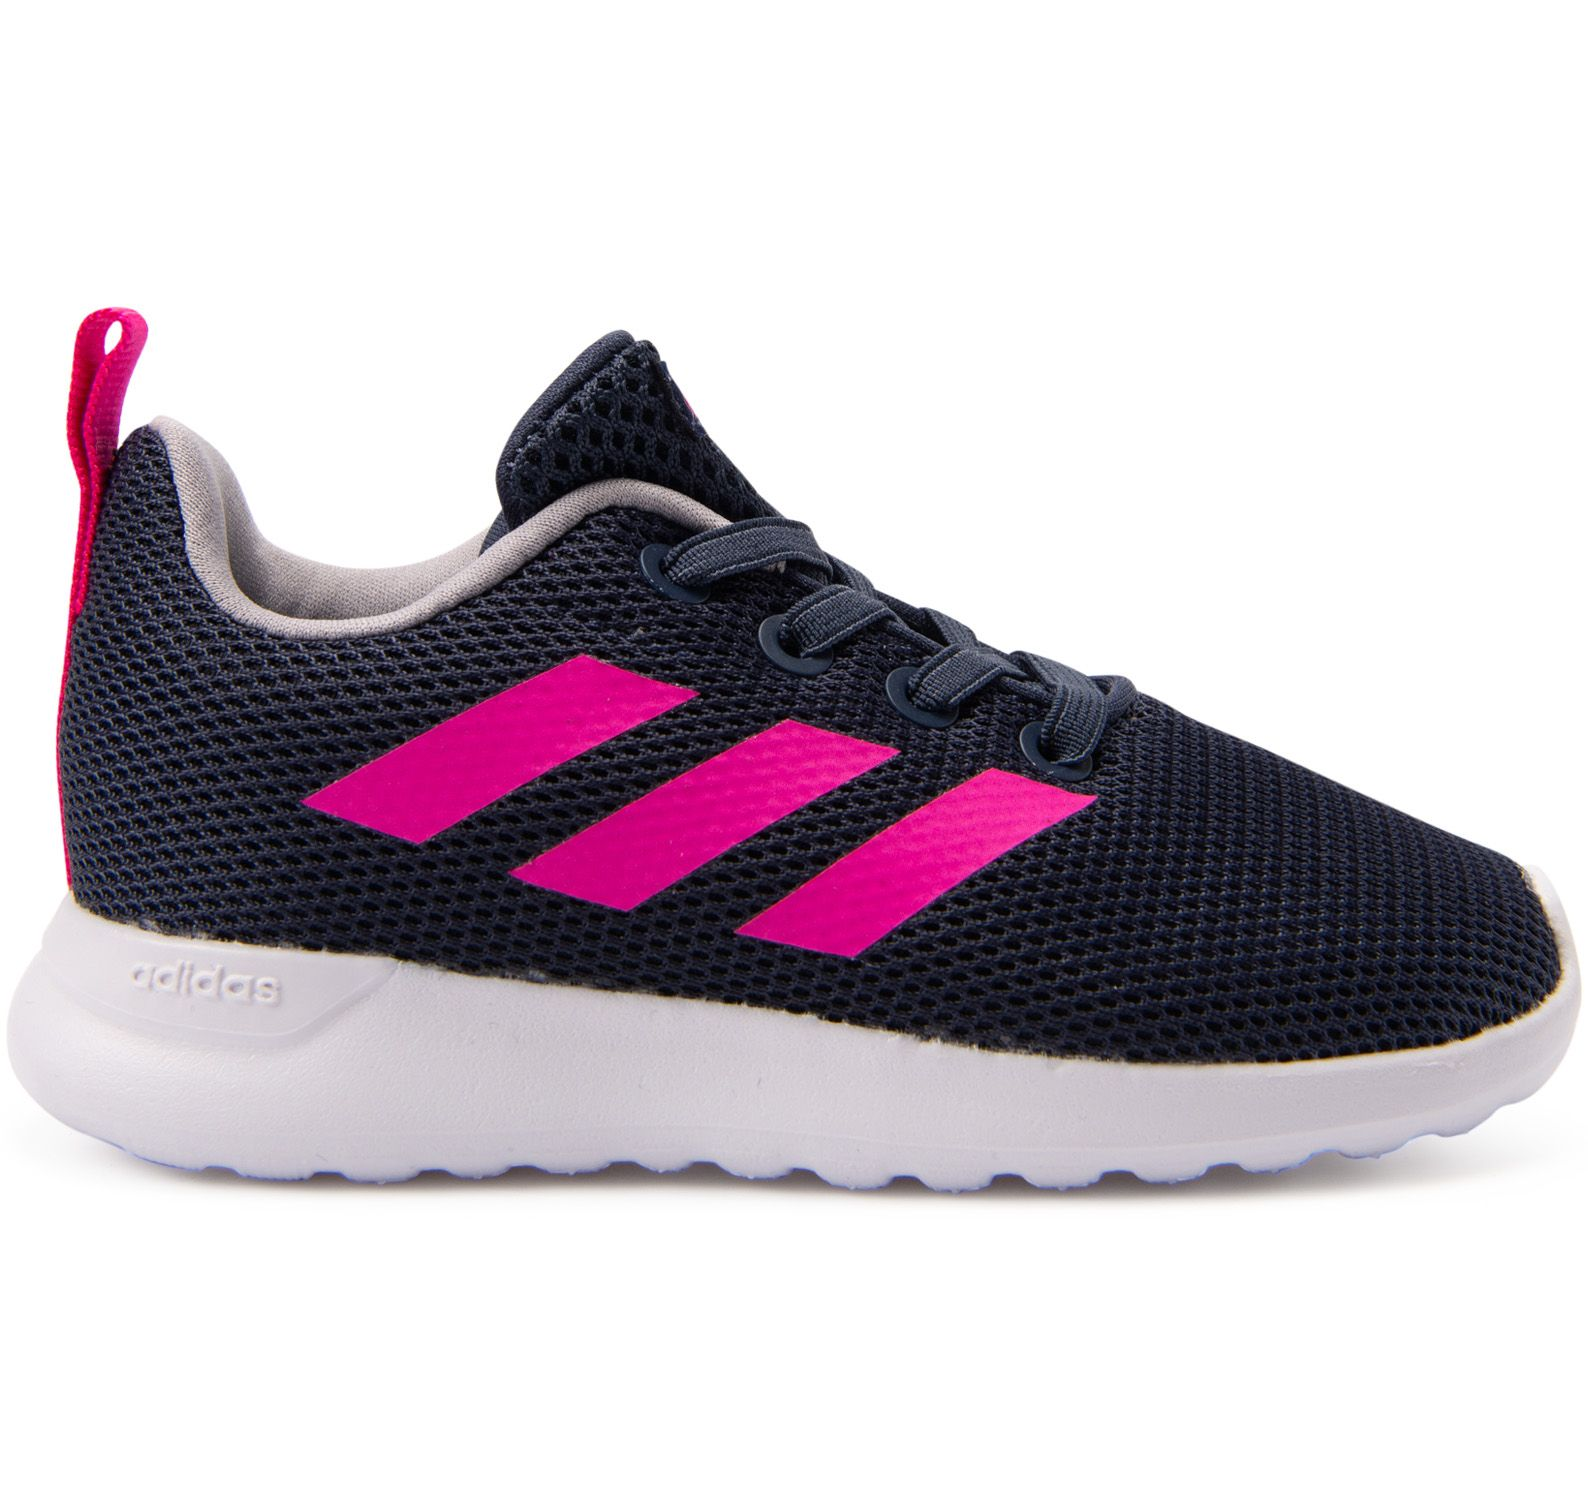 Lite Racer Cln I, Trablu/Shopnk/Ftwwht, 23.5,  Adidas